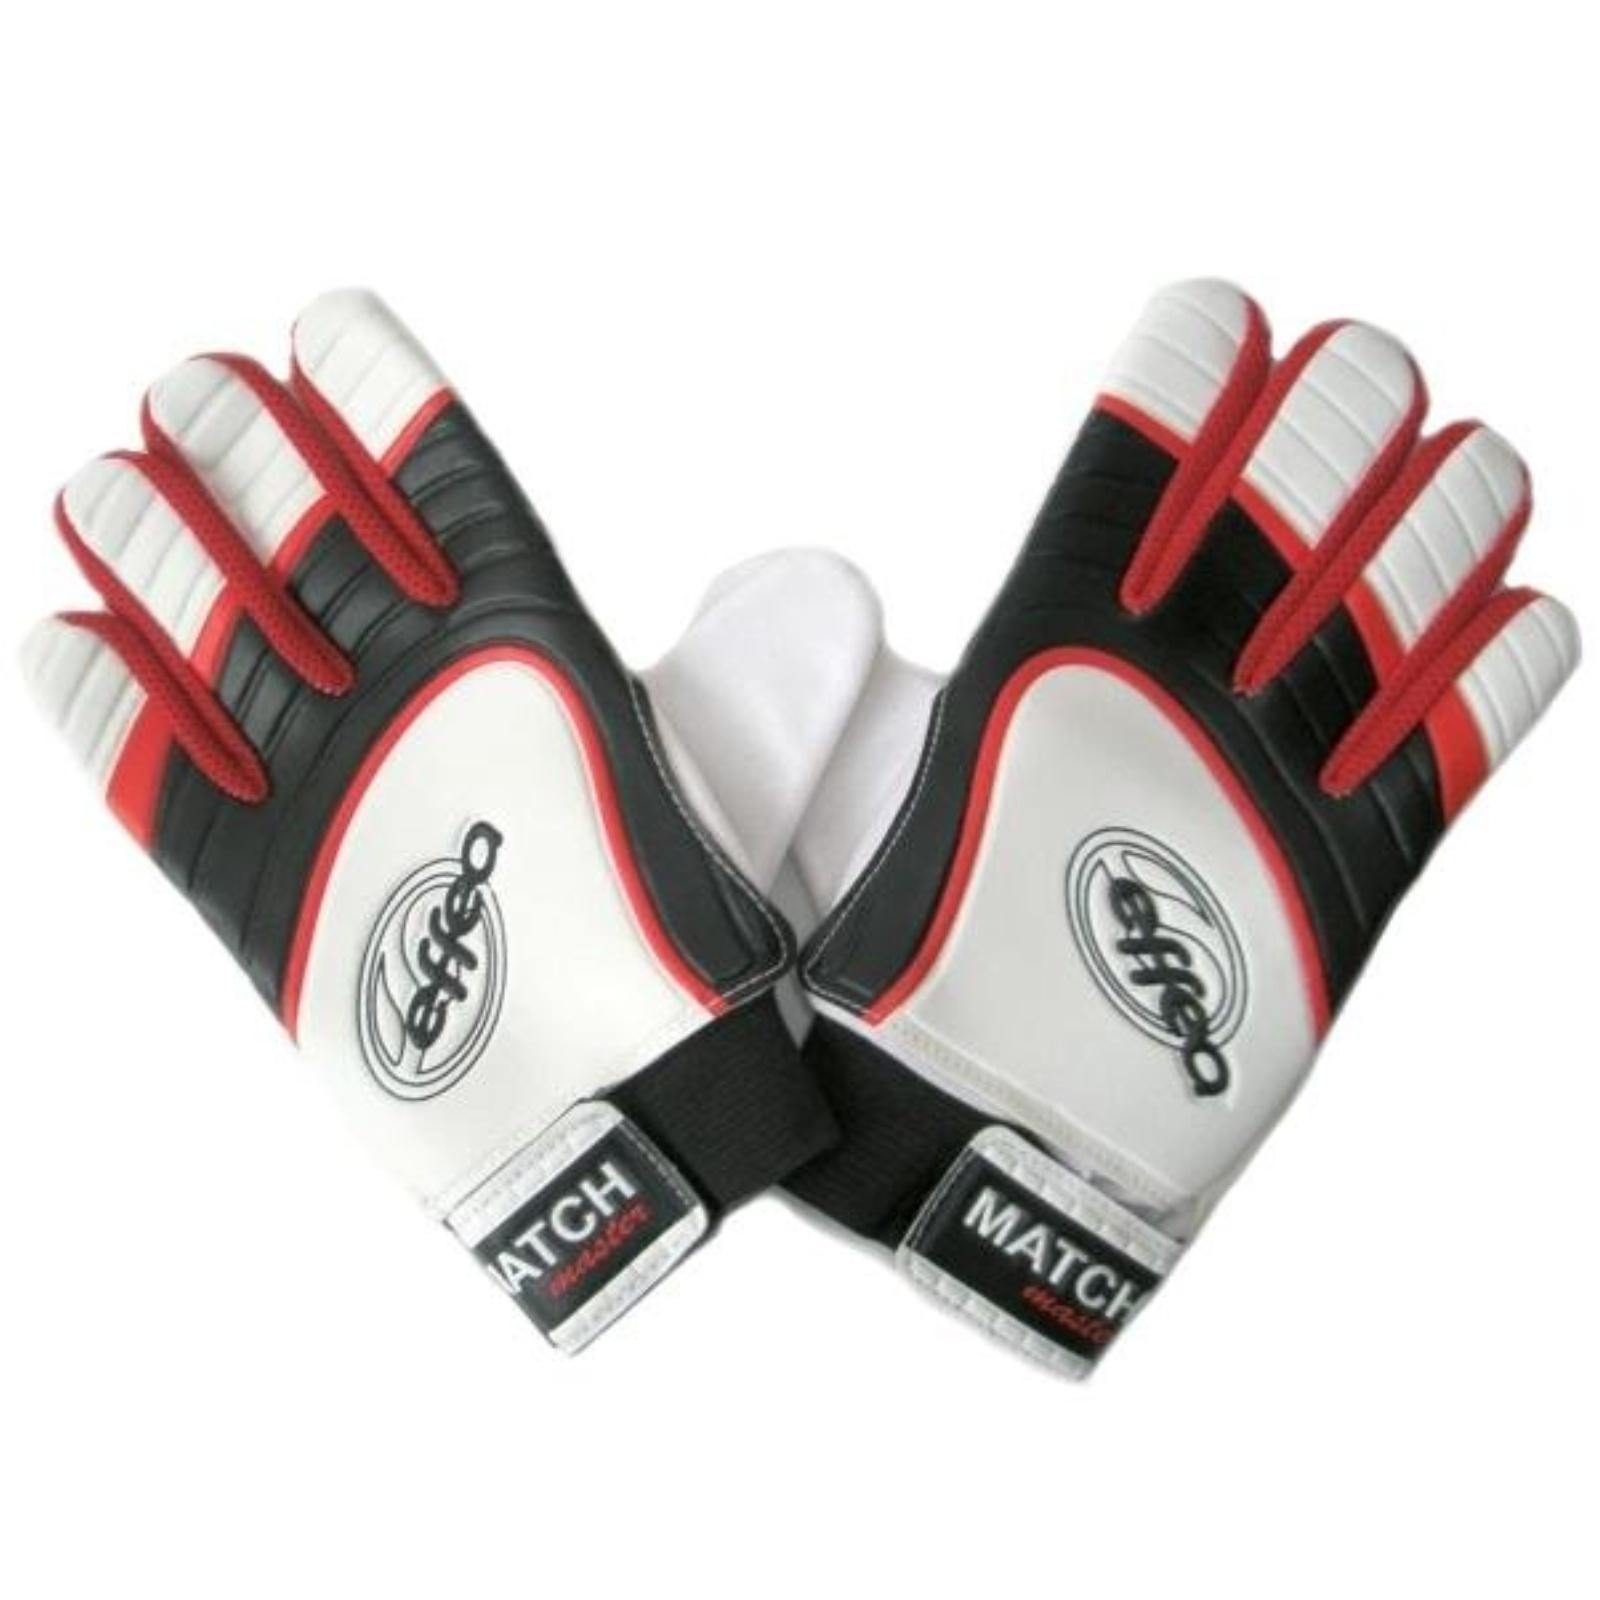 Futbalové rukavice EFFEA 6019 detské - veľ. 7